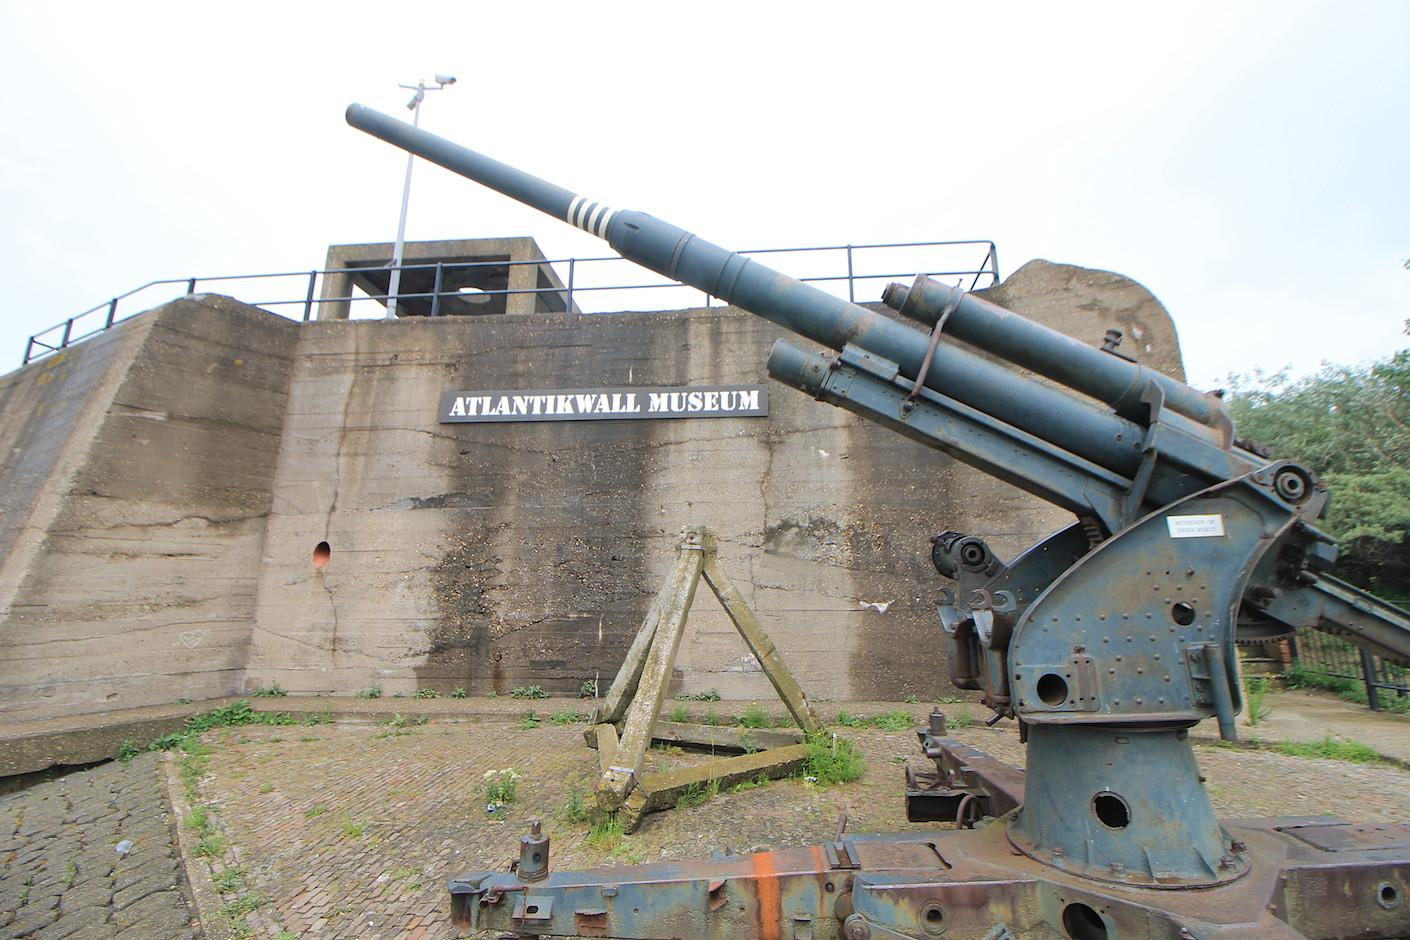 Bunker Atlantikwall Karte.Das Atlantikwall Museum In Hoek Van Holland